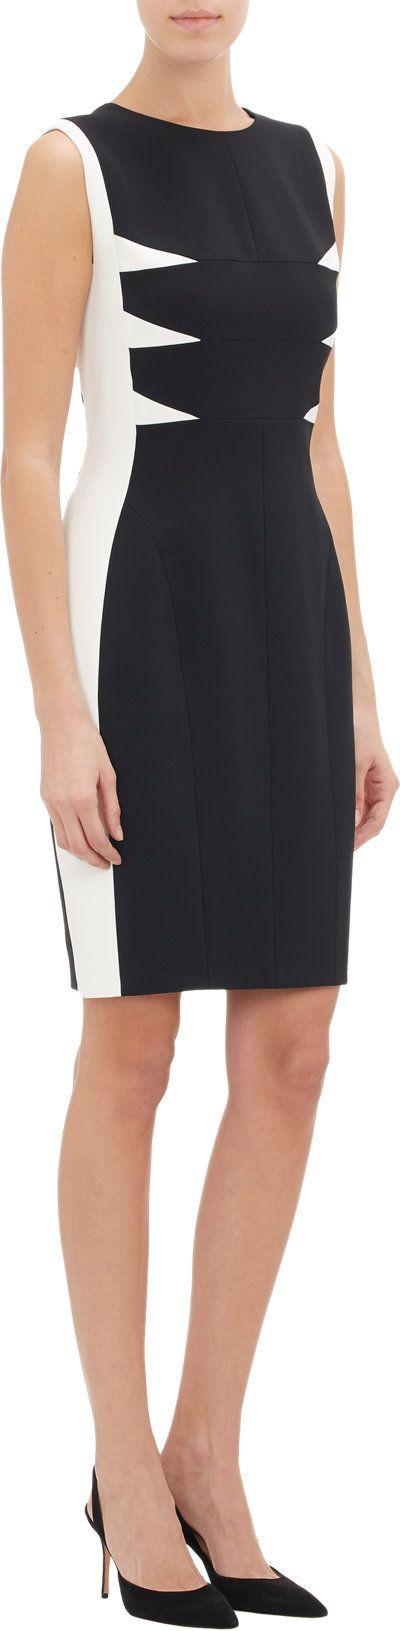 Narciso Rodriguez Colorblock Shift Dress at Barneys.com